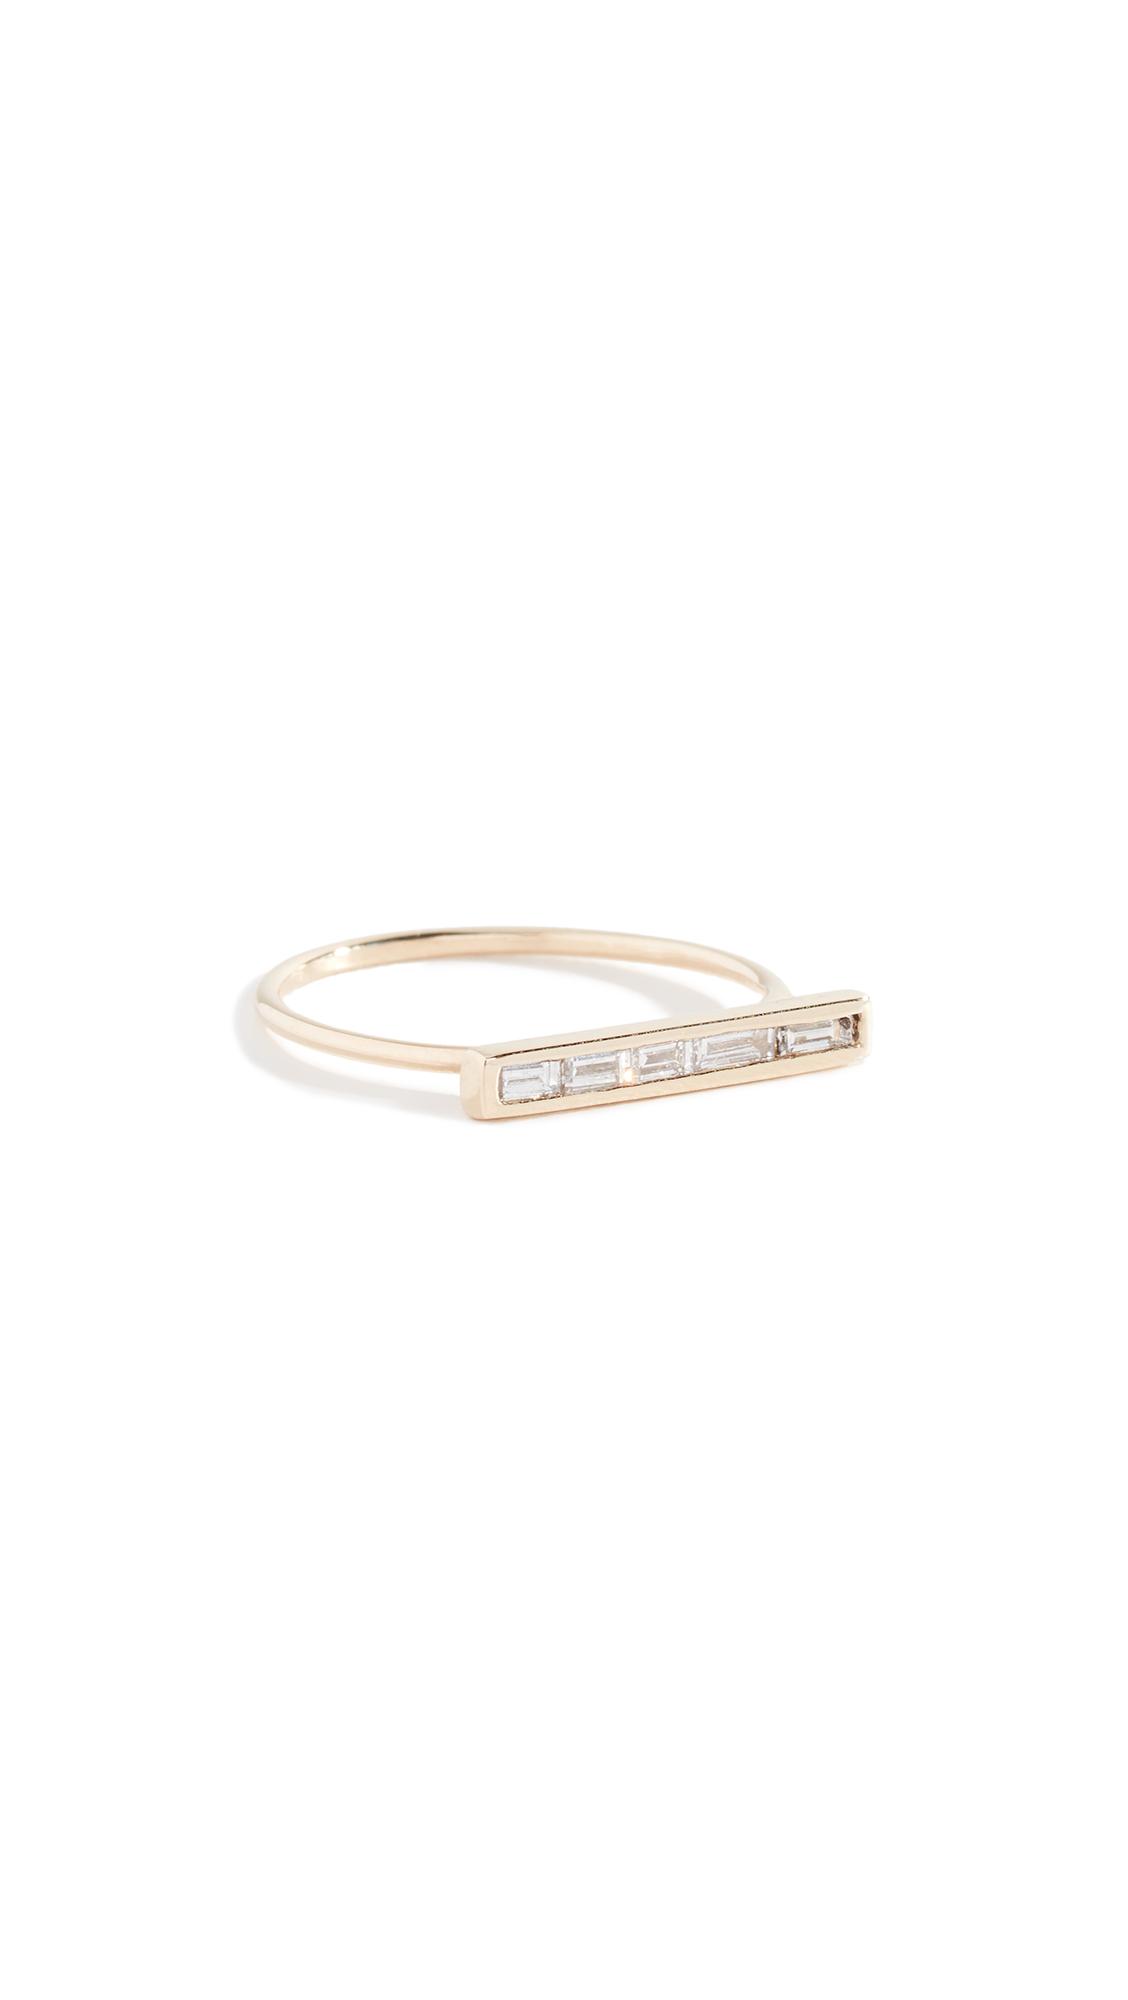 ARIEL GORDON JEWELRY 14K Baguette Diamond Ring in Yellow Gold